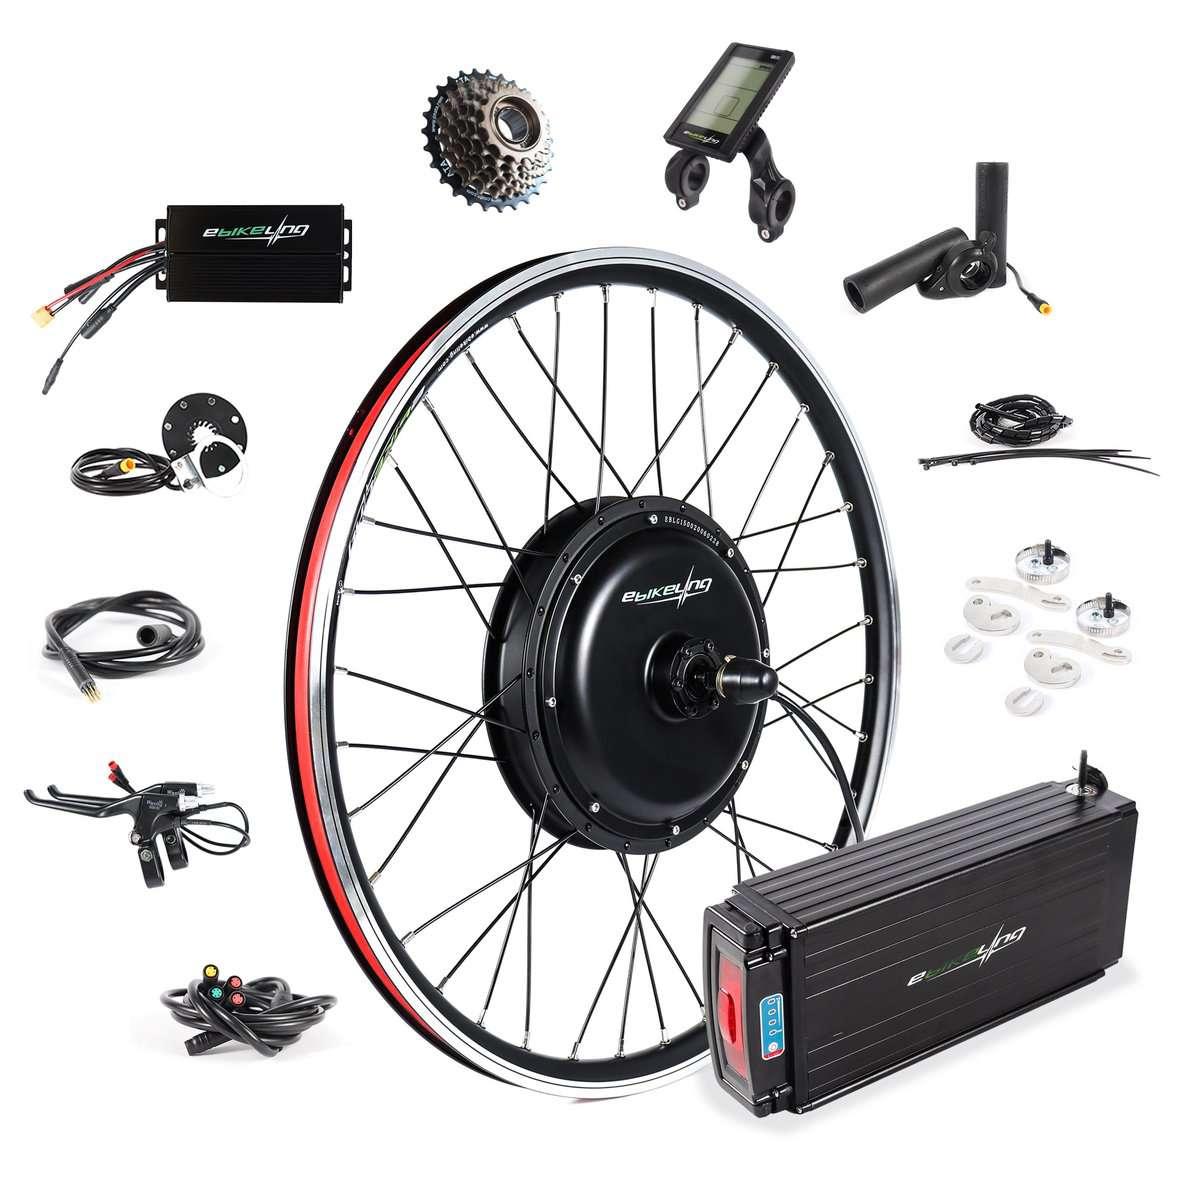 "Ebikeling Waterproof 48V 1500W 26"" Direct Drive Rear Ebike Conversion Kit"